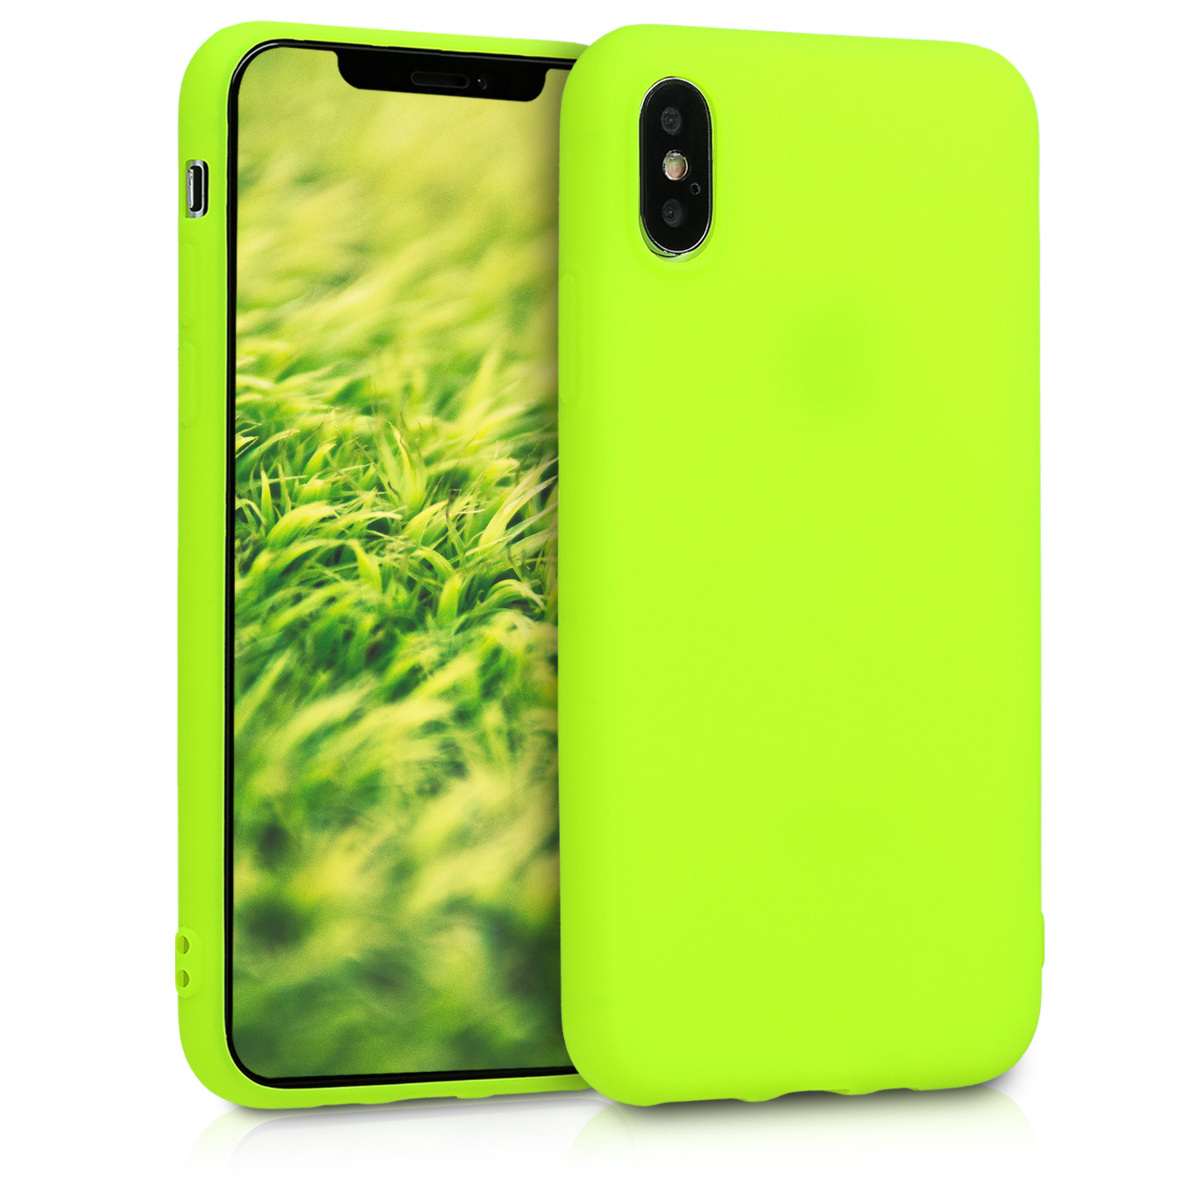 Kvalitní silikonové TPU pouzdro pro Apple iPhone XS - Neon Yellow